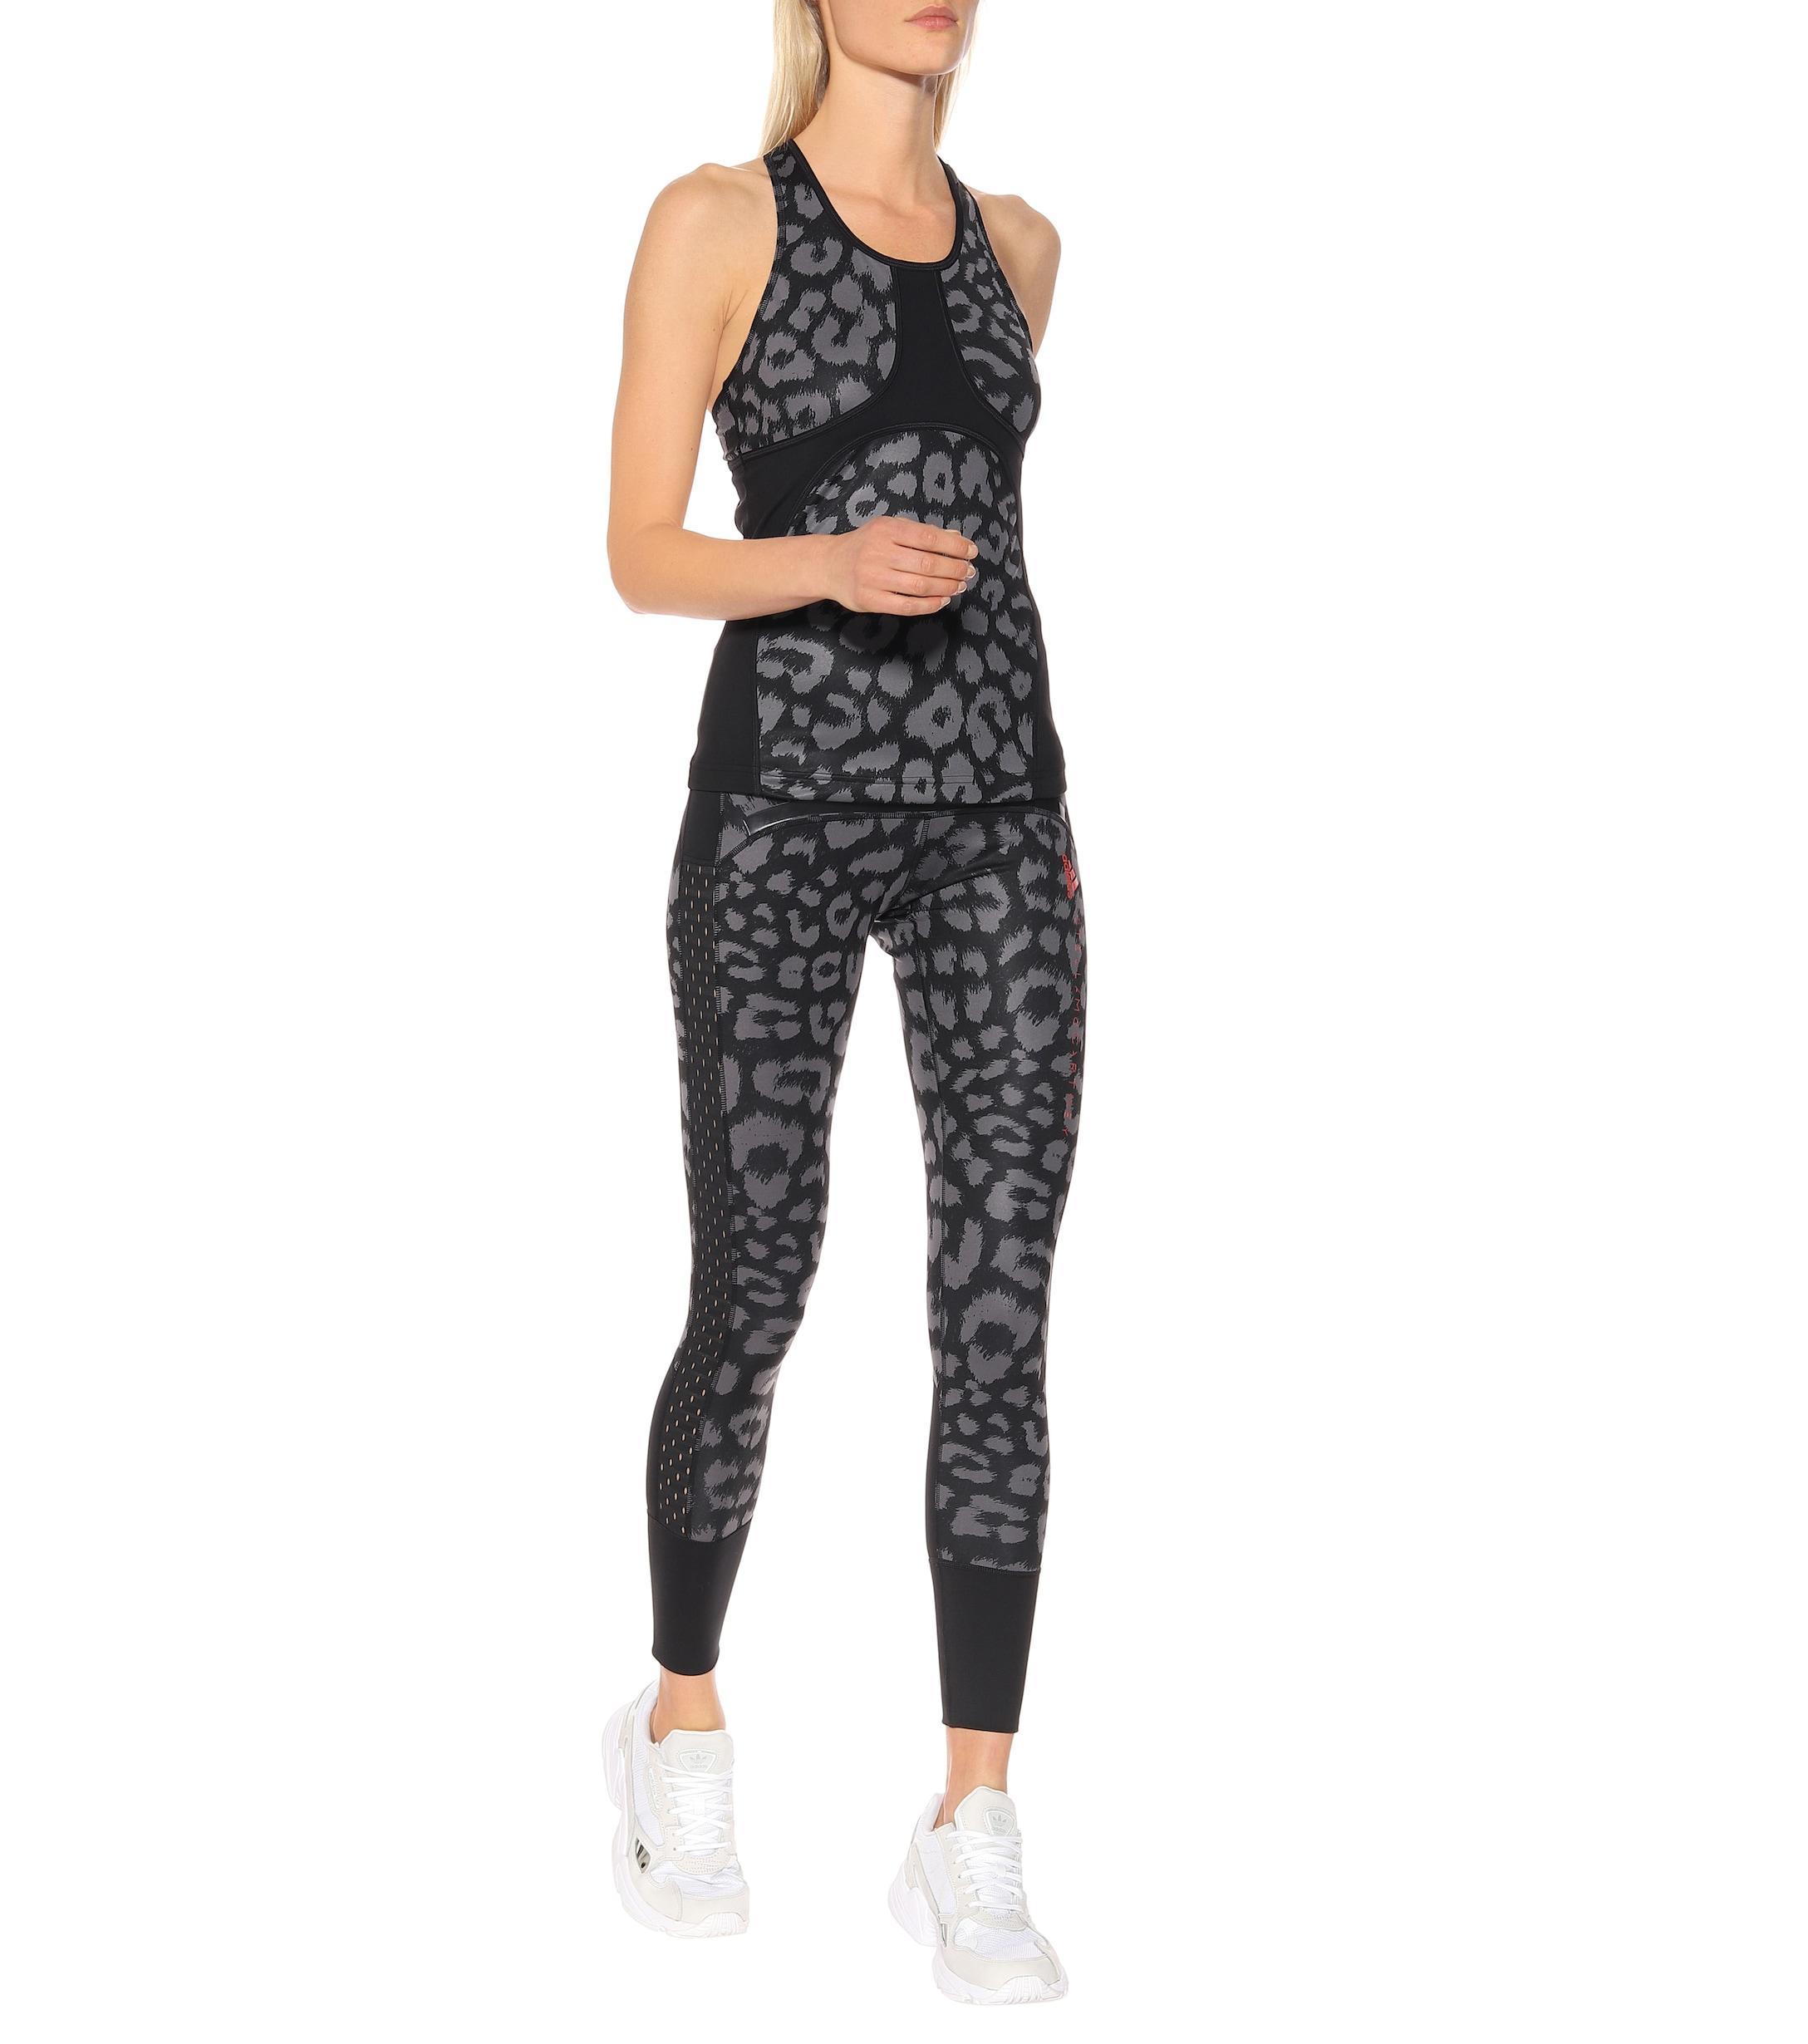 cc0bdc4fb68167 Adidas By Stella McCartney - Black Comfort Leopard-print Tank Top - Lyst.  View fullscreen